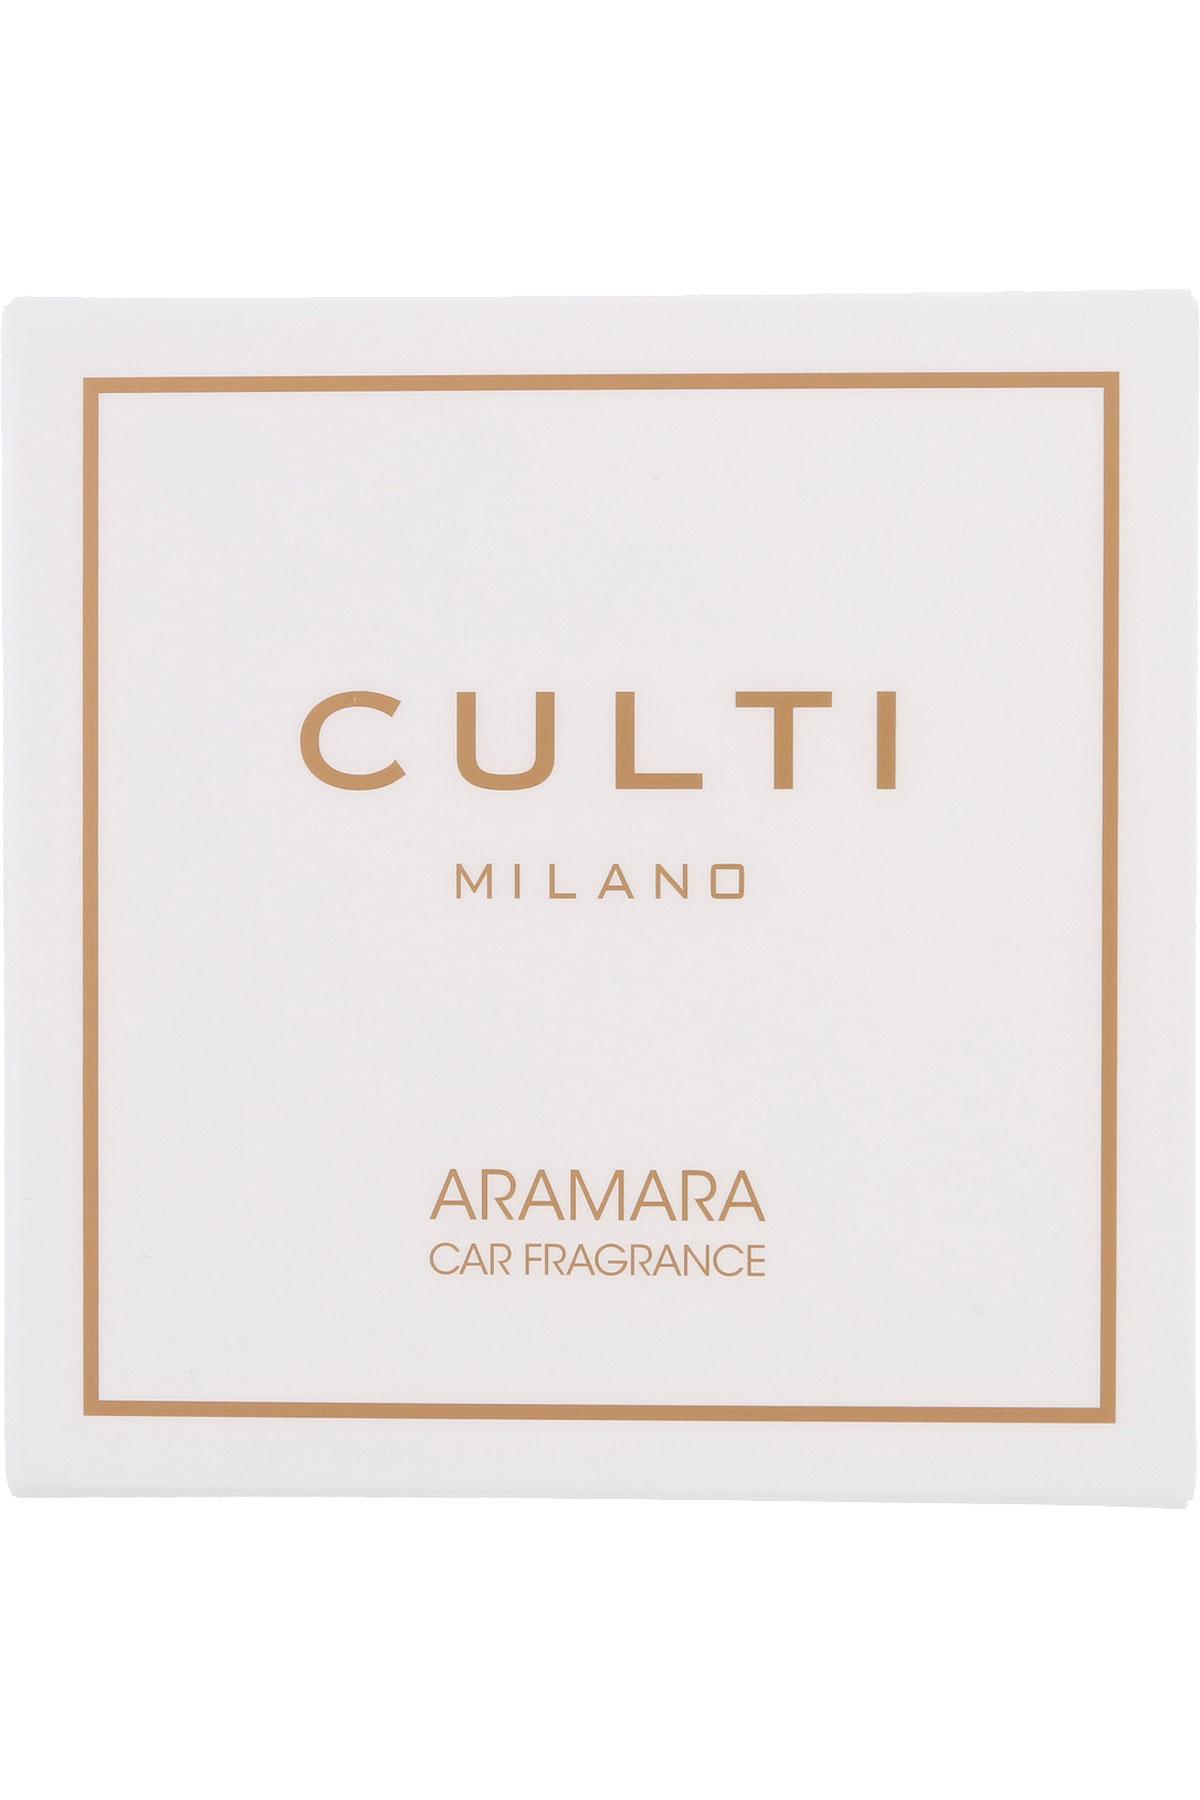 Culti Milano Home Scents for Men On Sale, Aramara - Car Fragrance, 2019